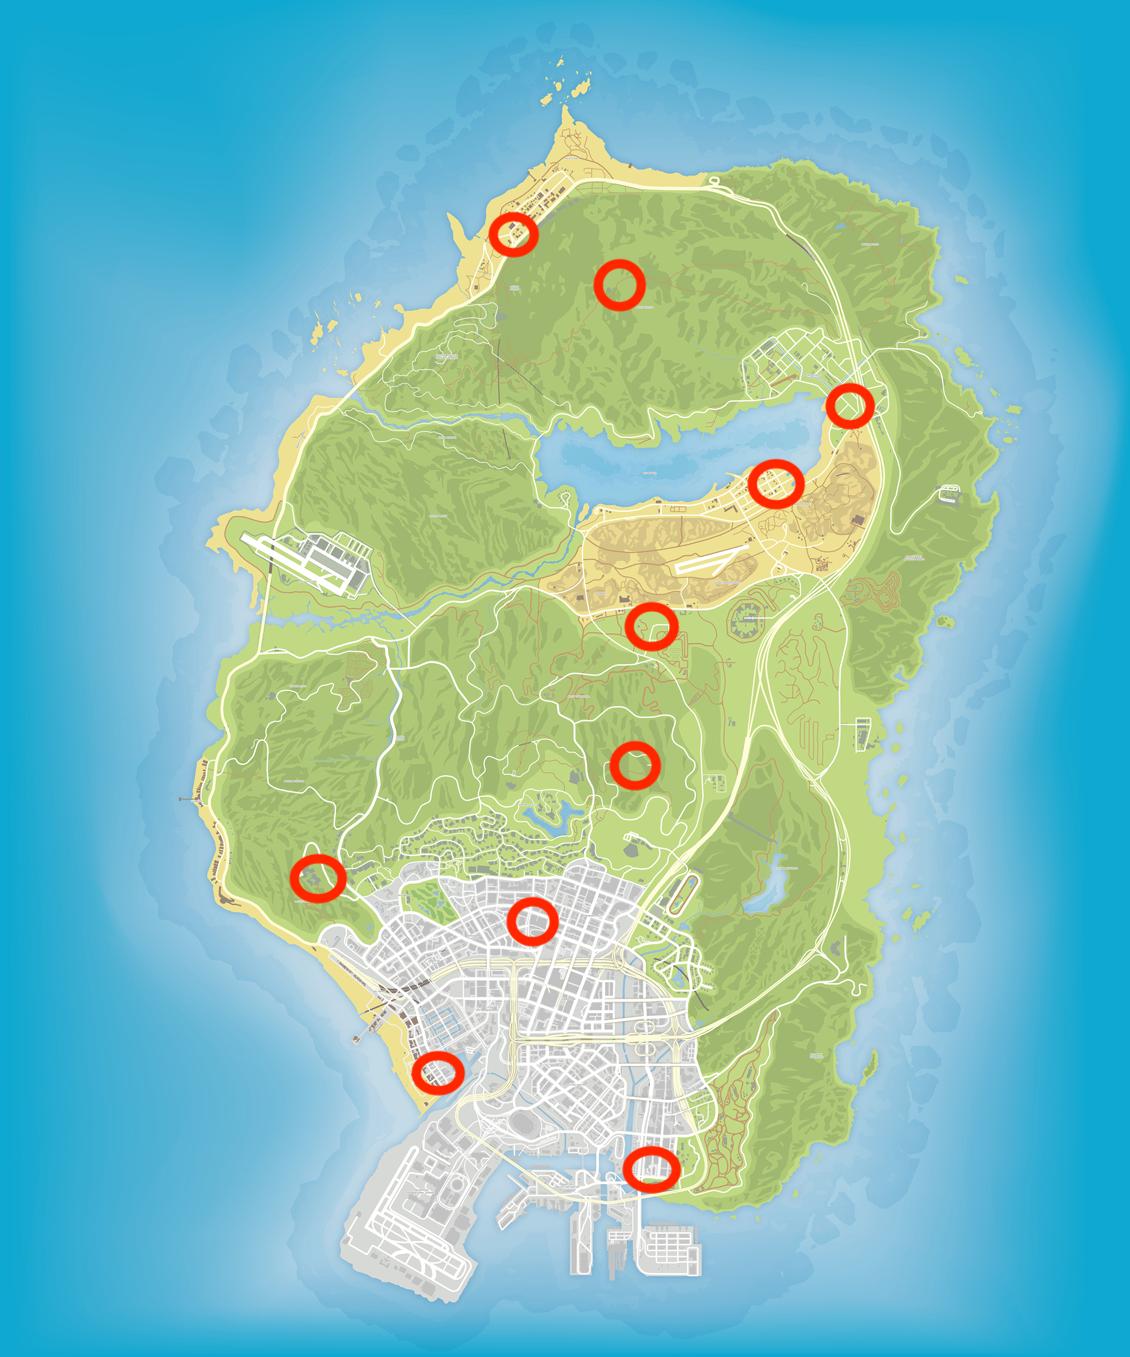 GTA Online: Locations of the 10 radio antennas